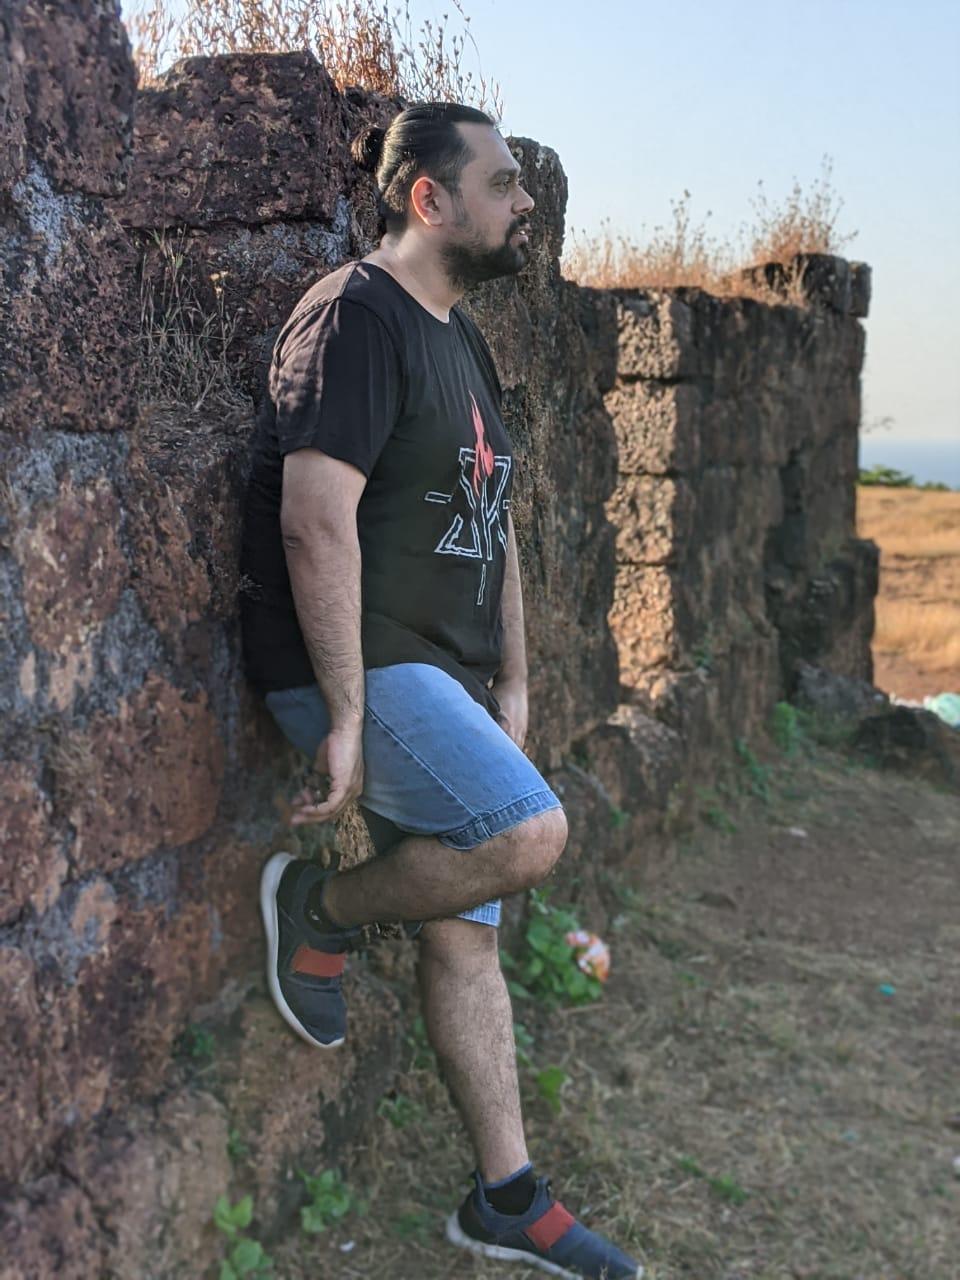 Pratik Bhatia's Profile Image